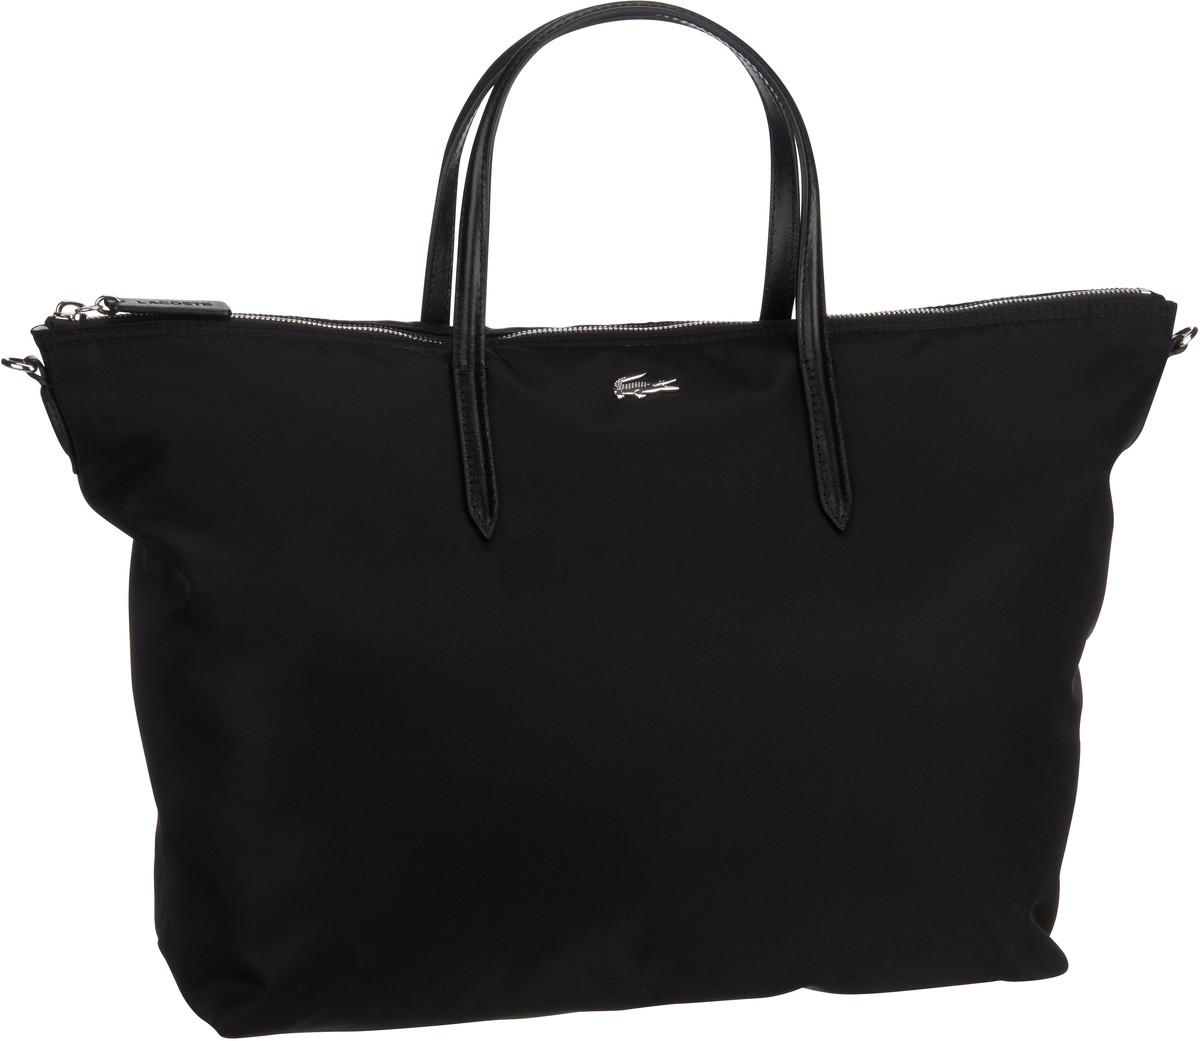 Lacoste Shopper SStrap Shopping Bag L 2606 Black